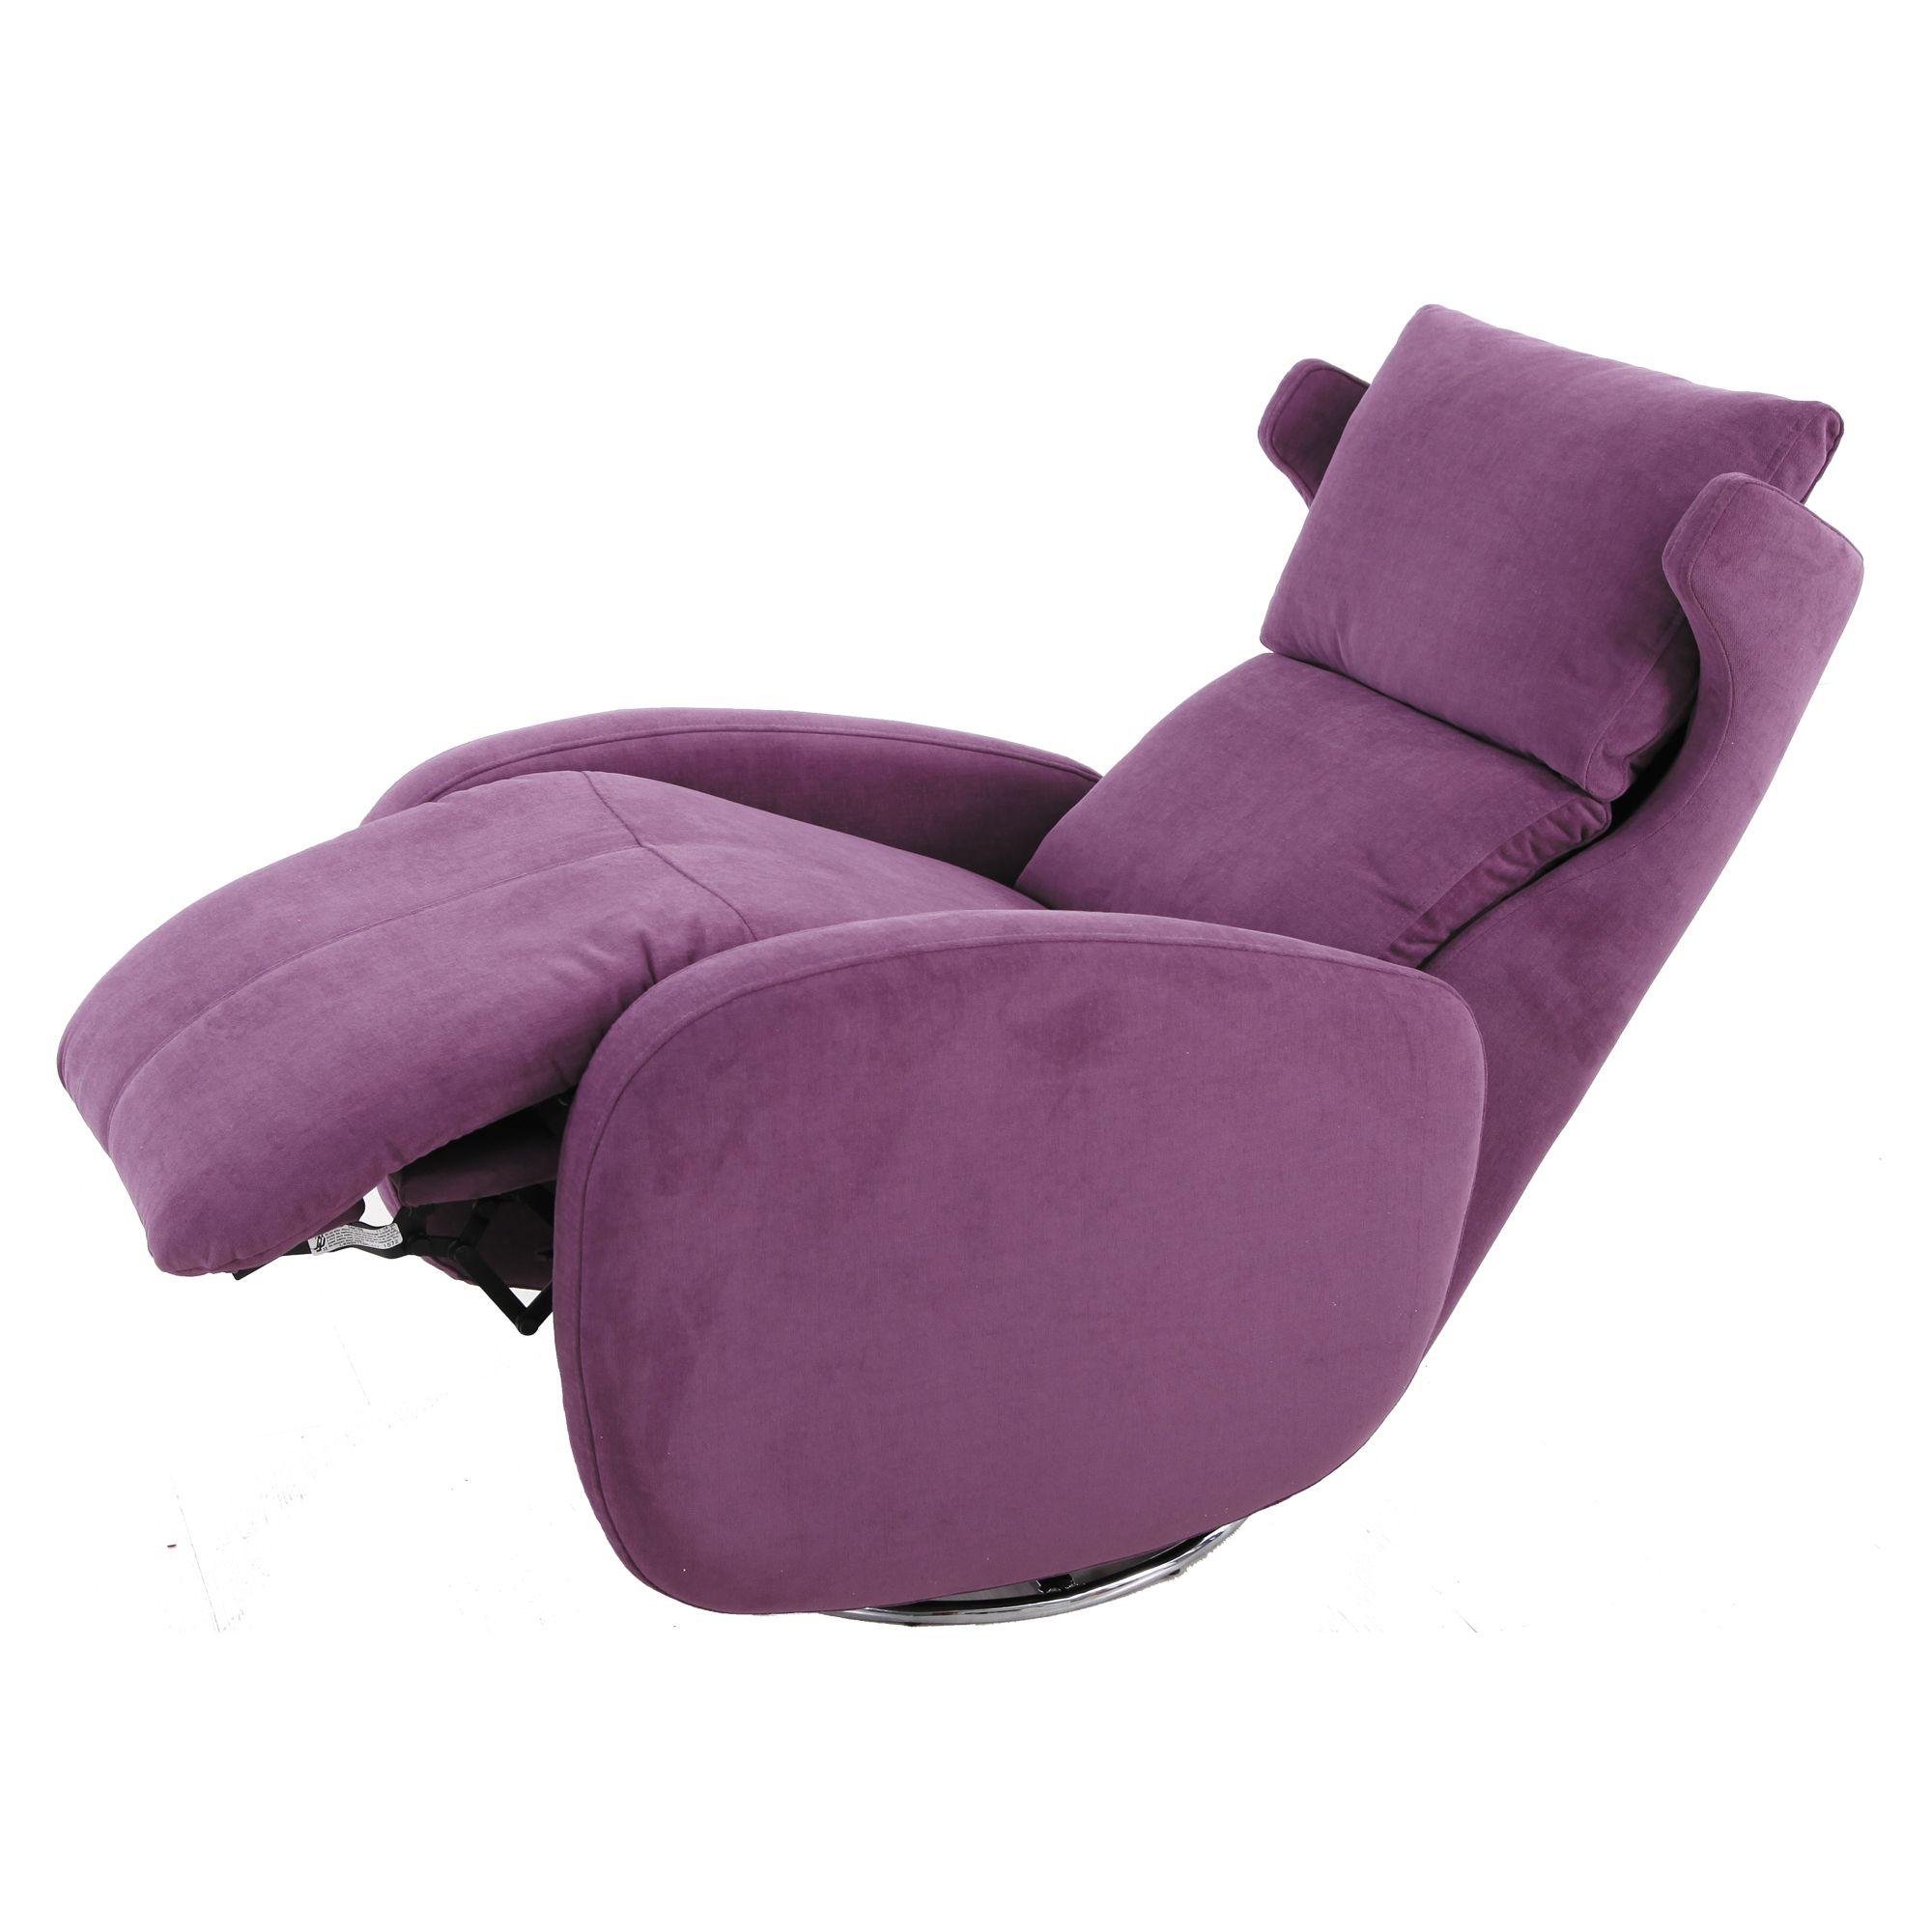 Fama Kim Manual Reclining Chair Fabric Series 6 Recliner